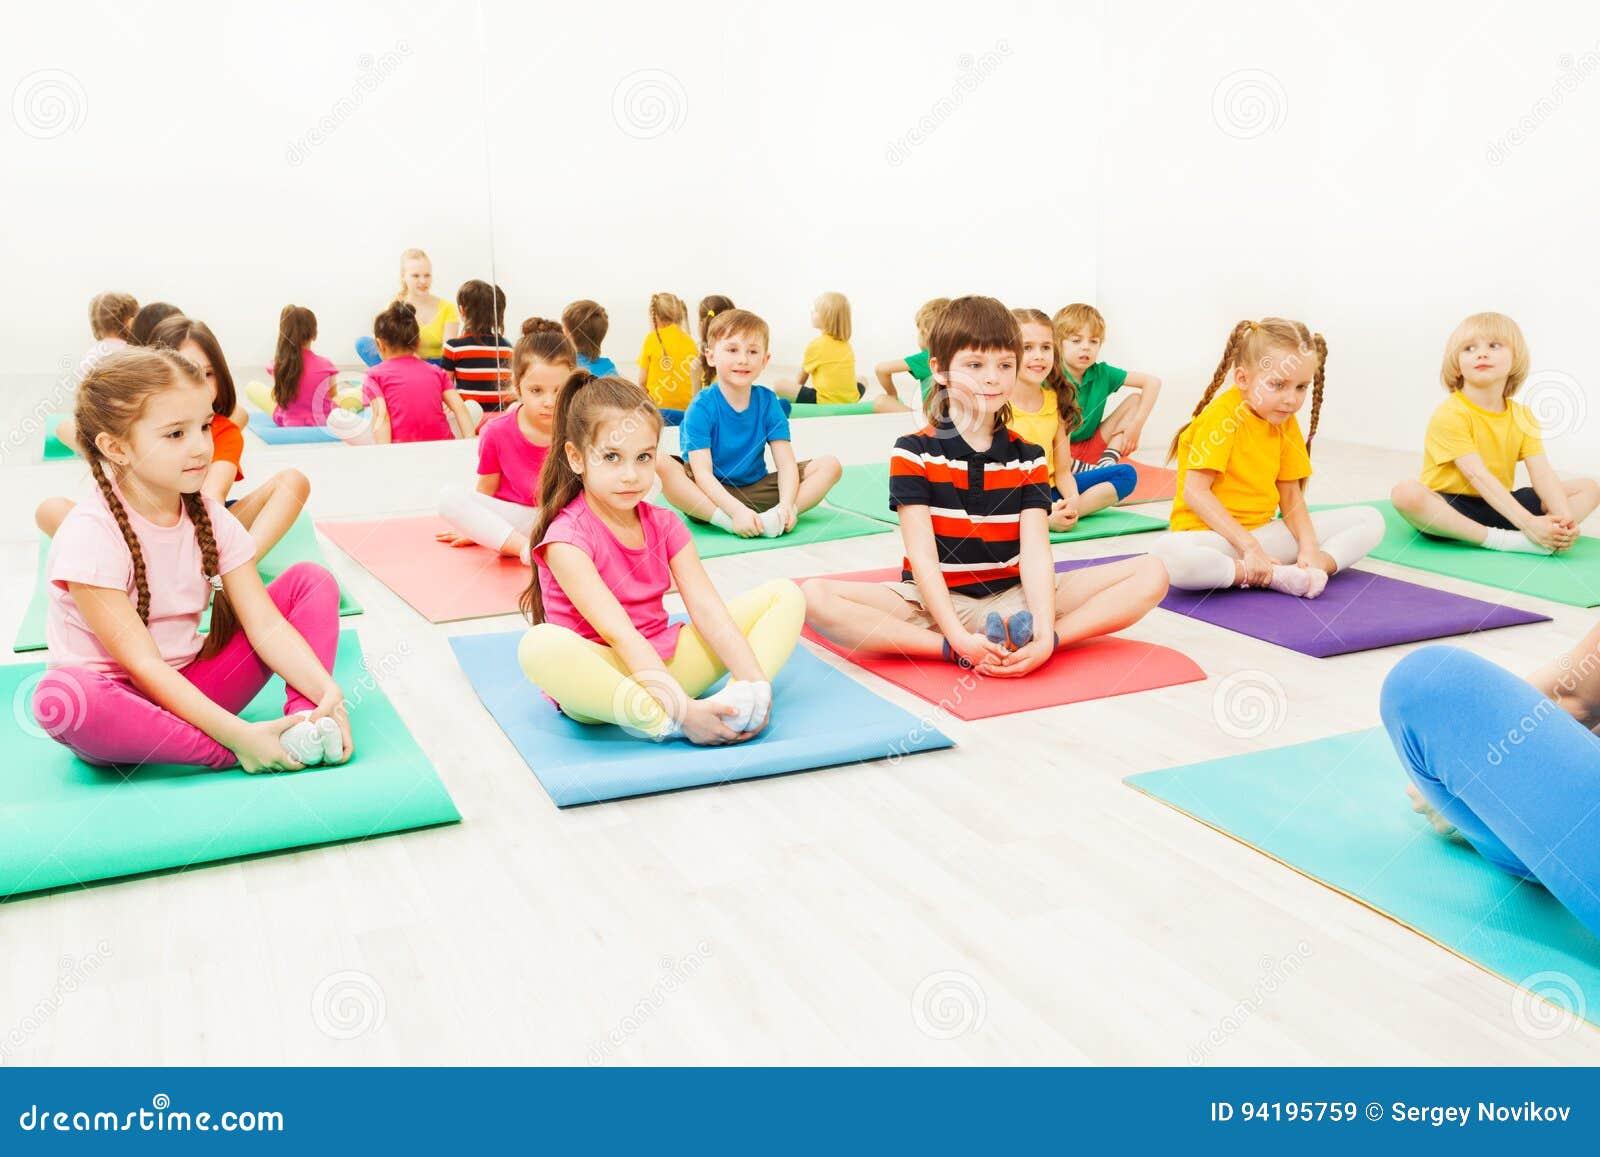 Kids Doing Butterfly Exercise Sitting On Yoga Mats Stock